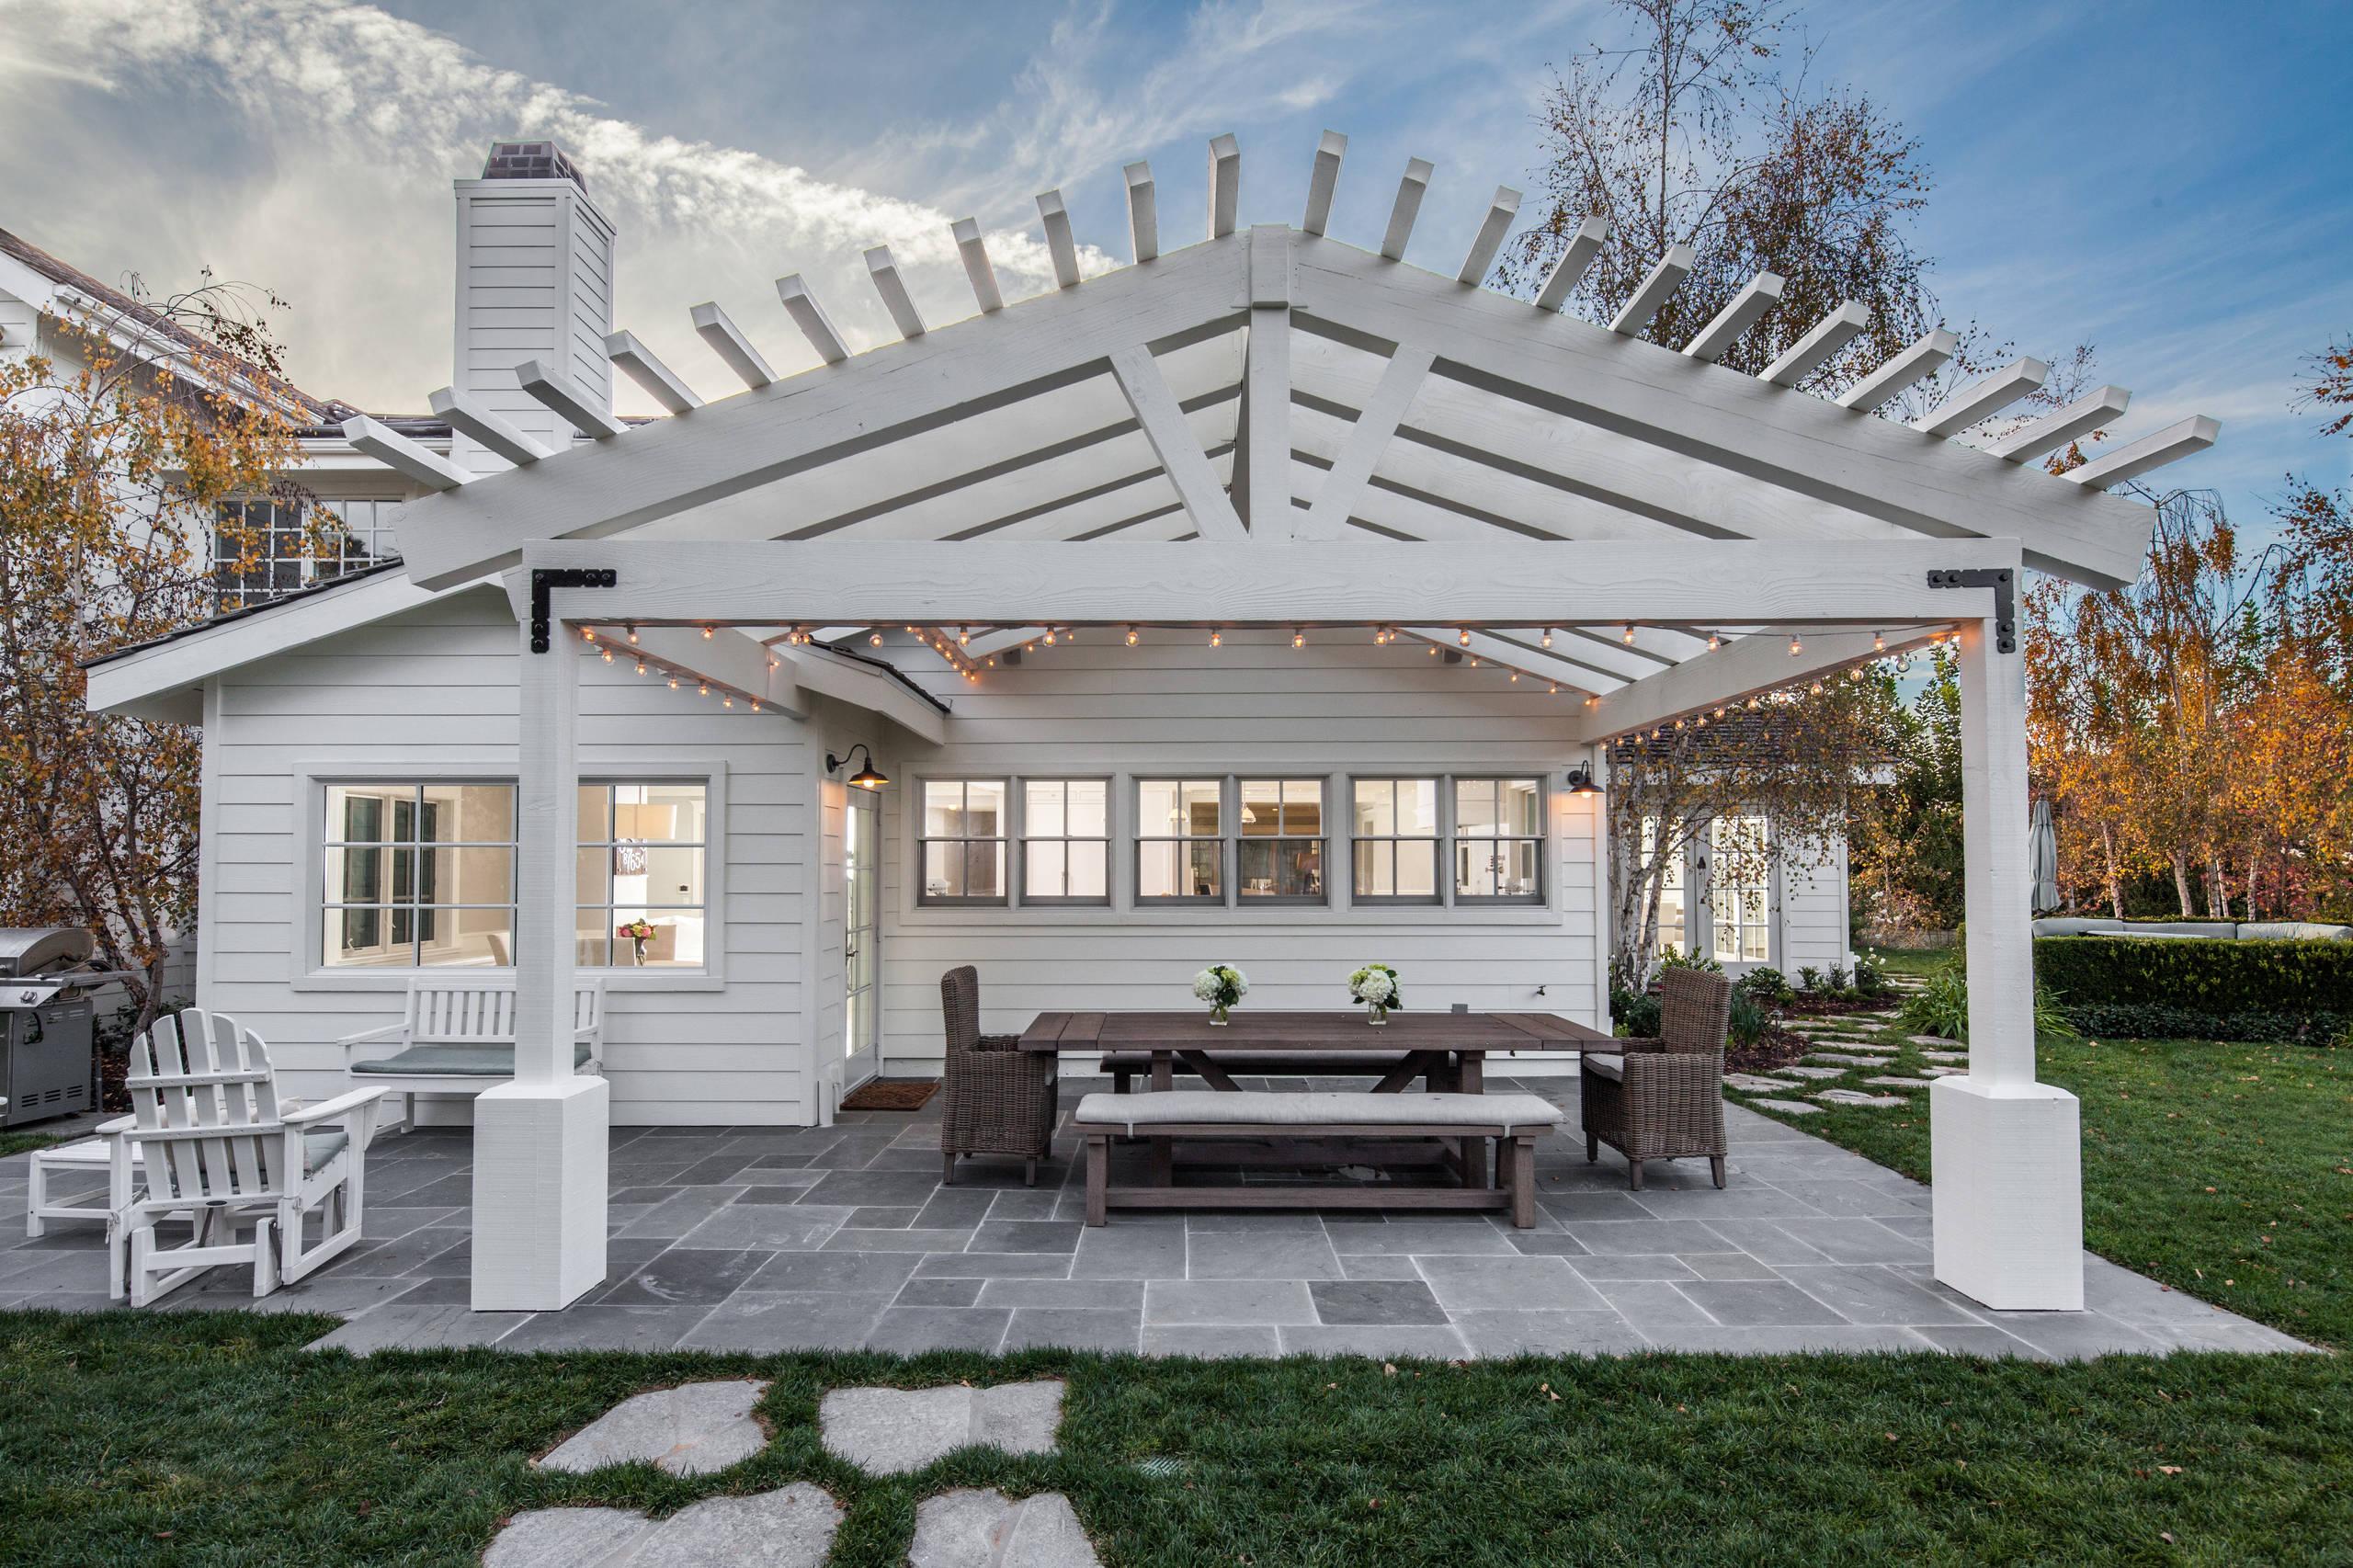 farmhouse patio pictures ideas